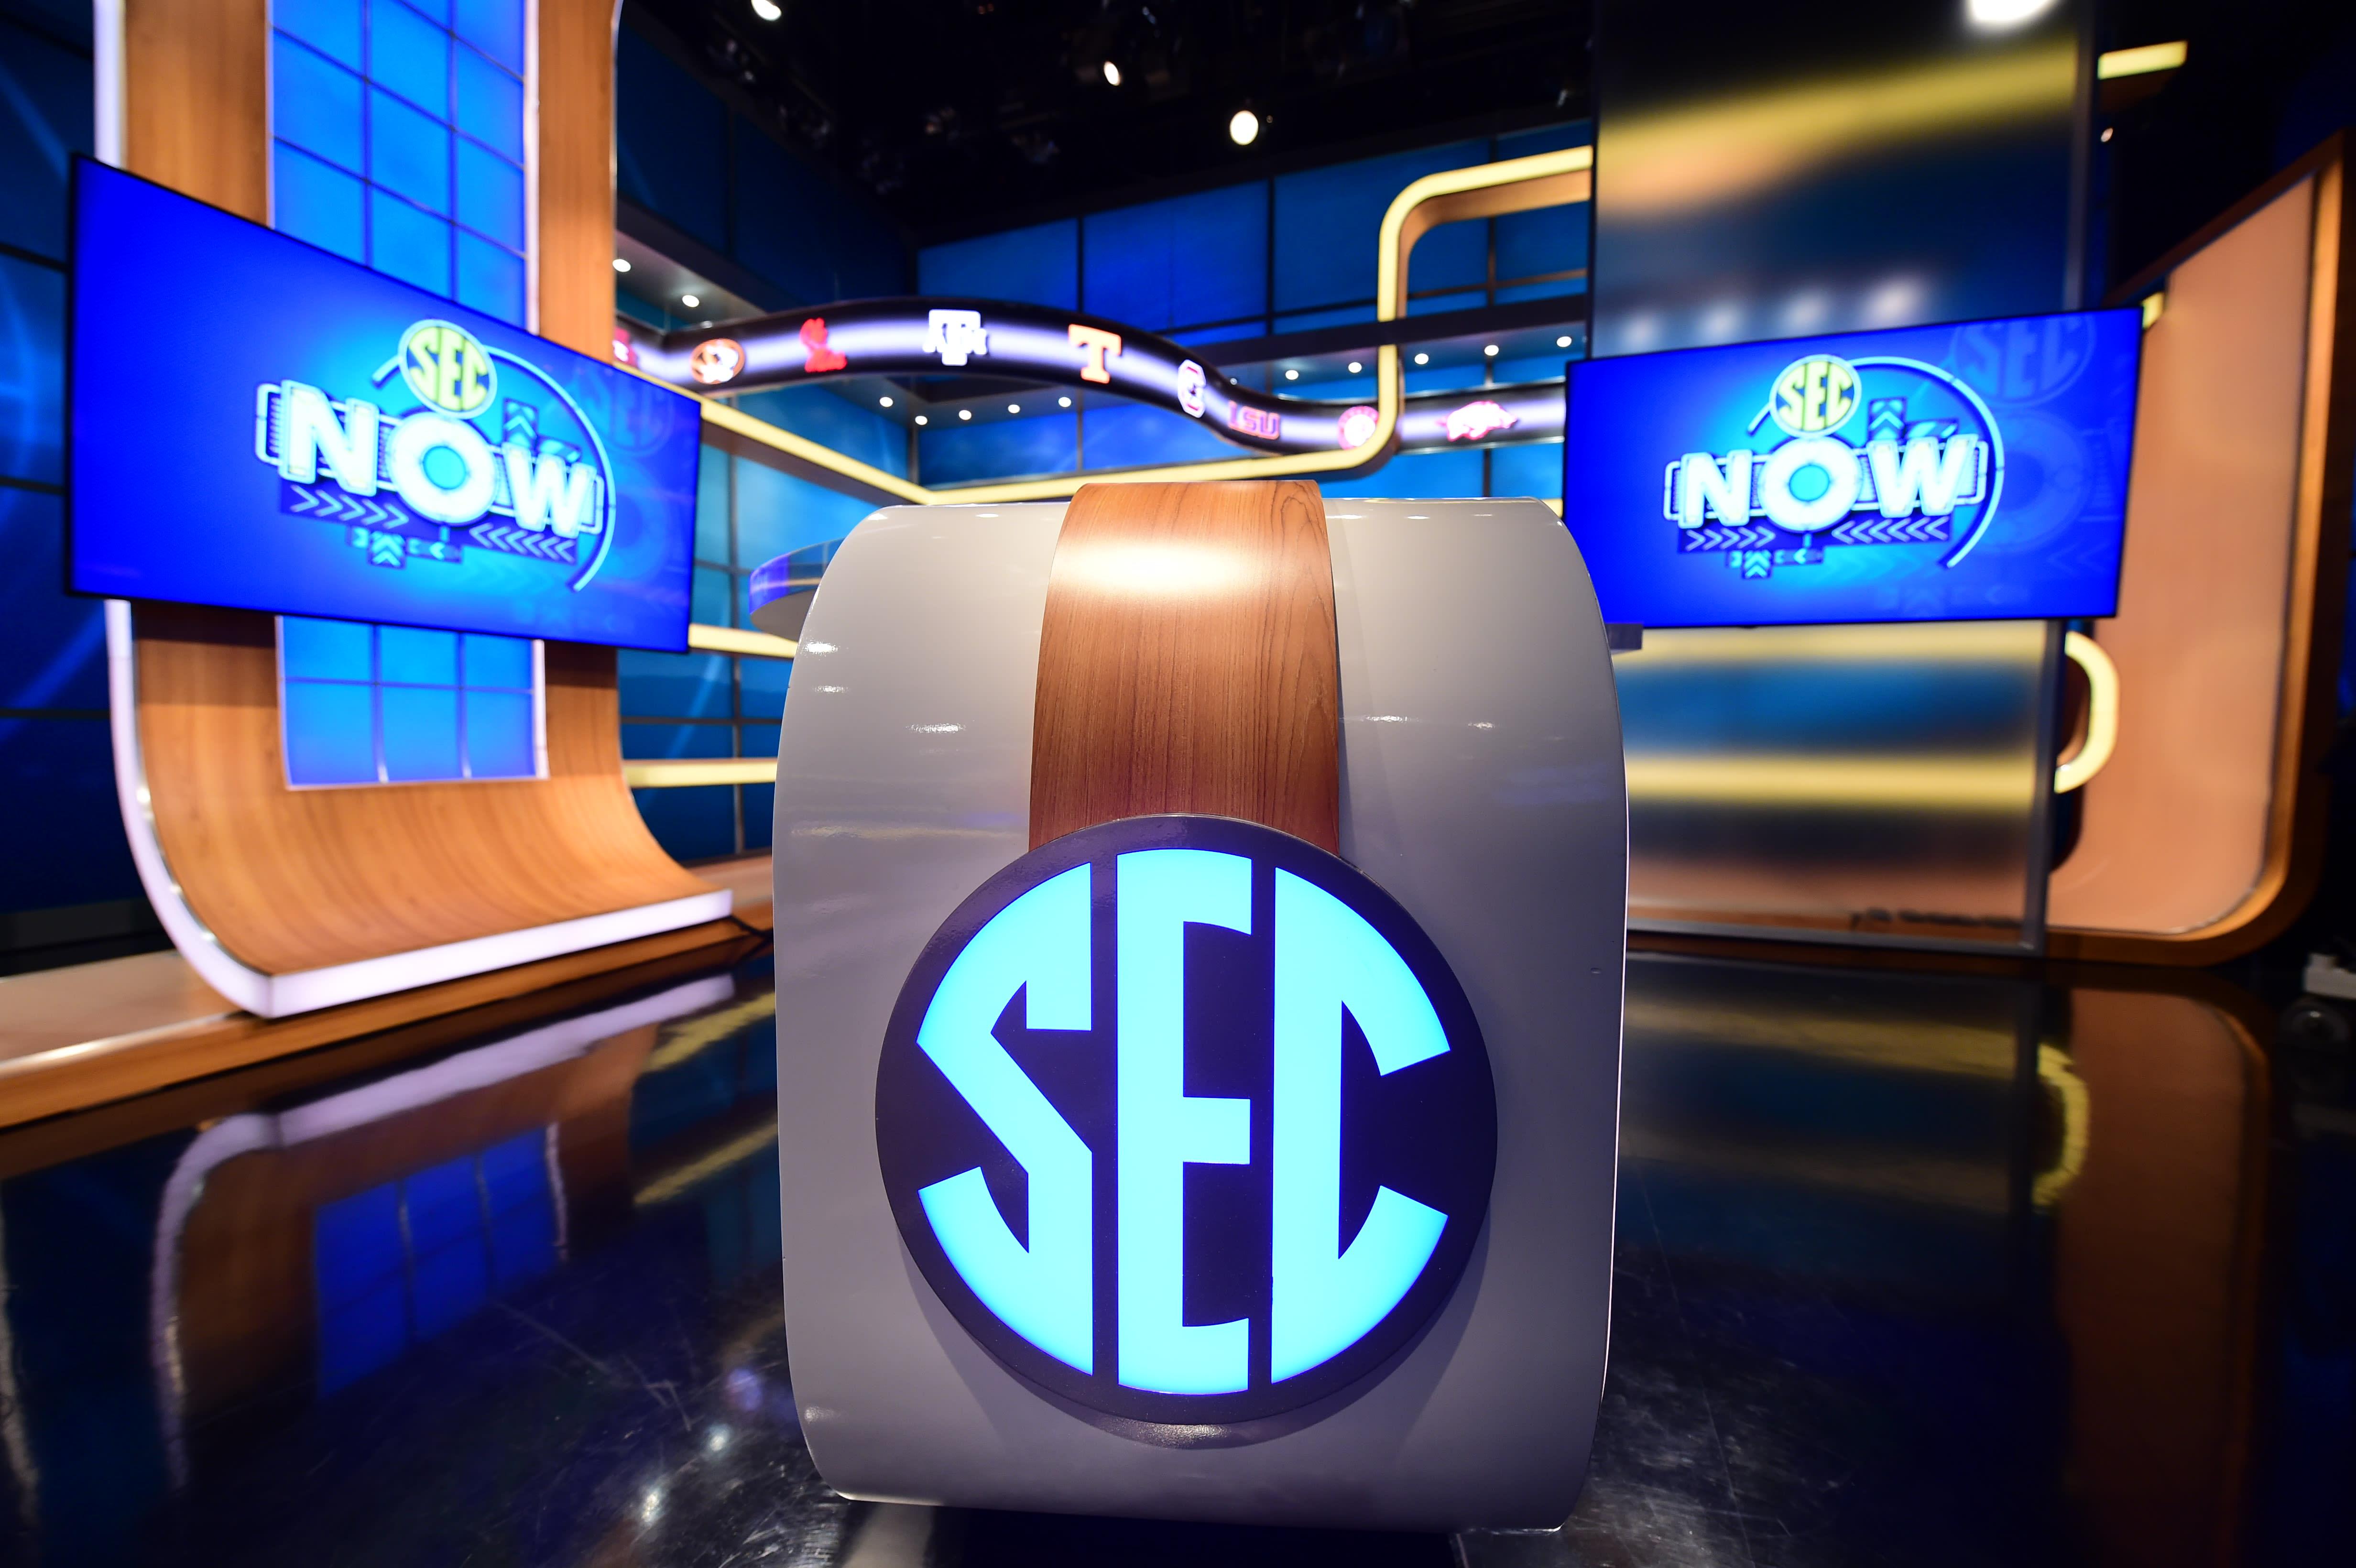 Image courtesy SEC Network/ESPN